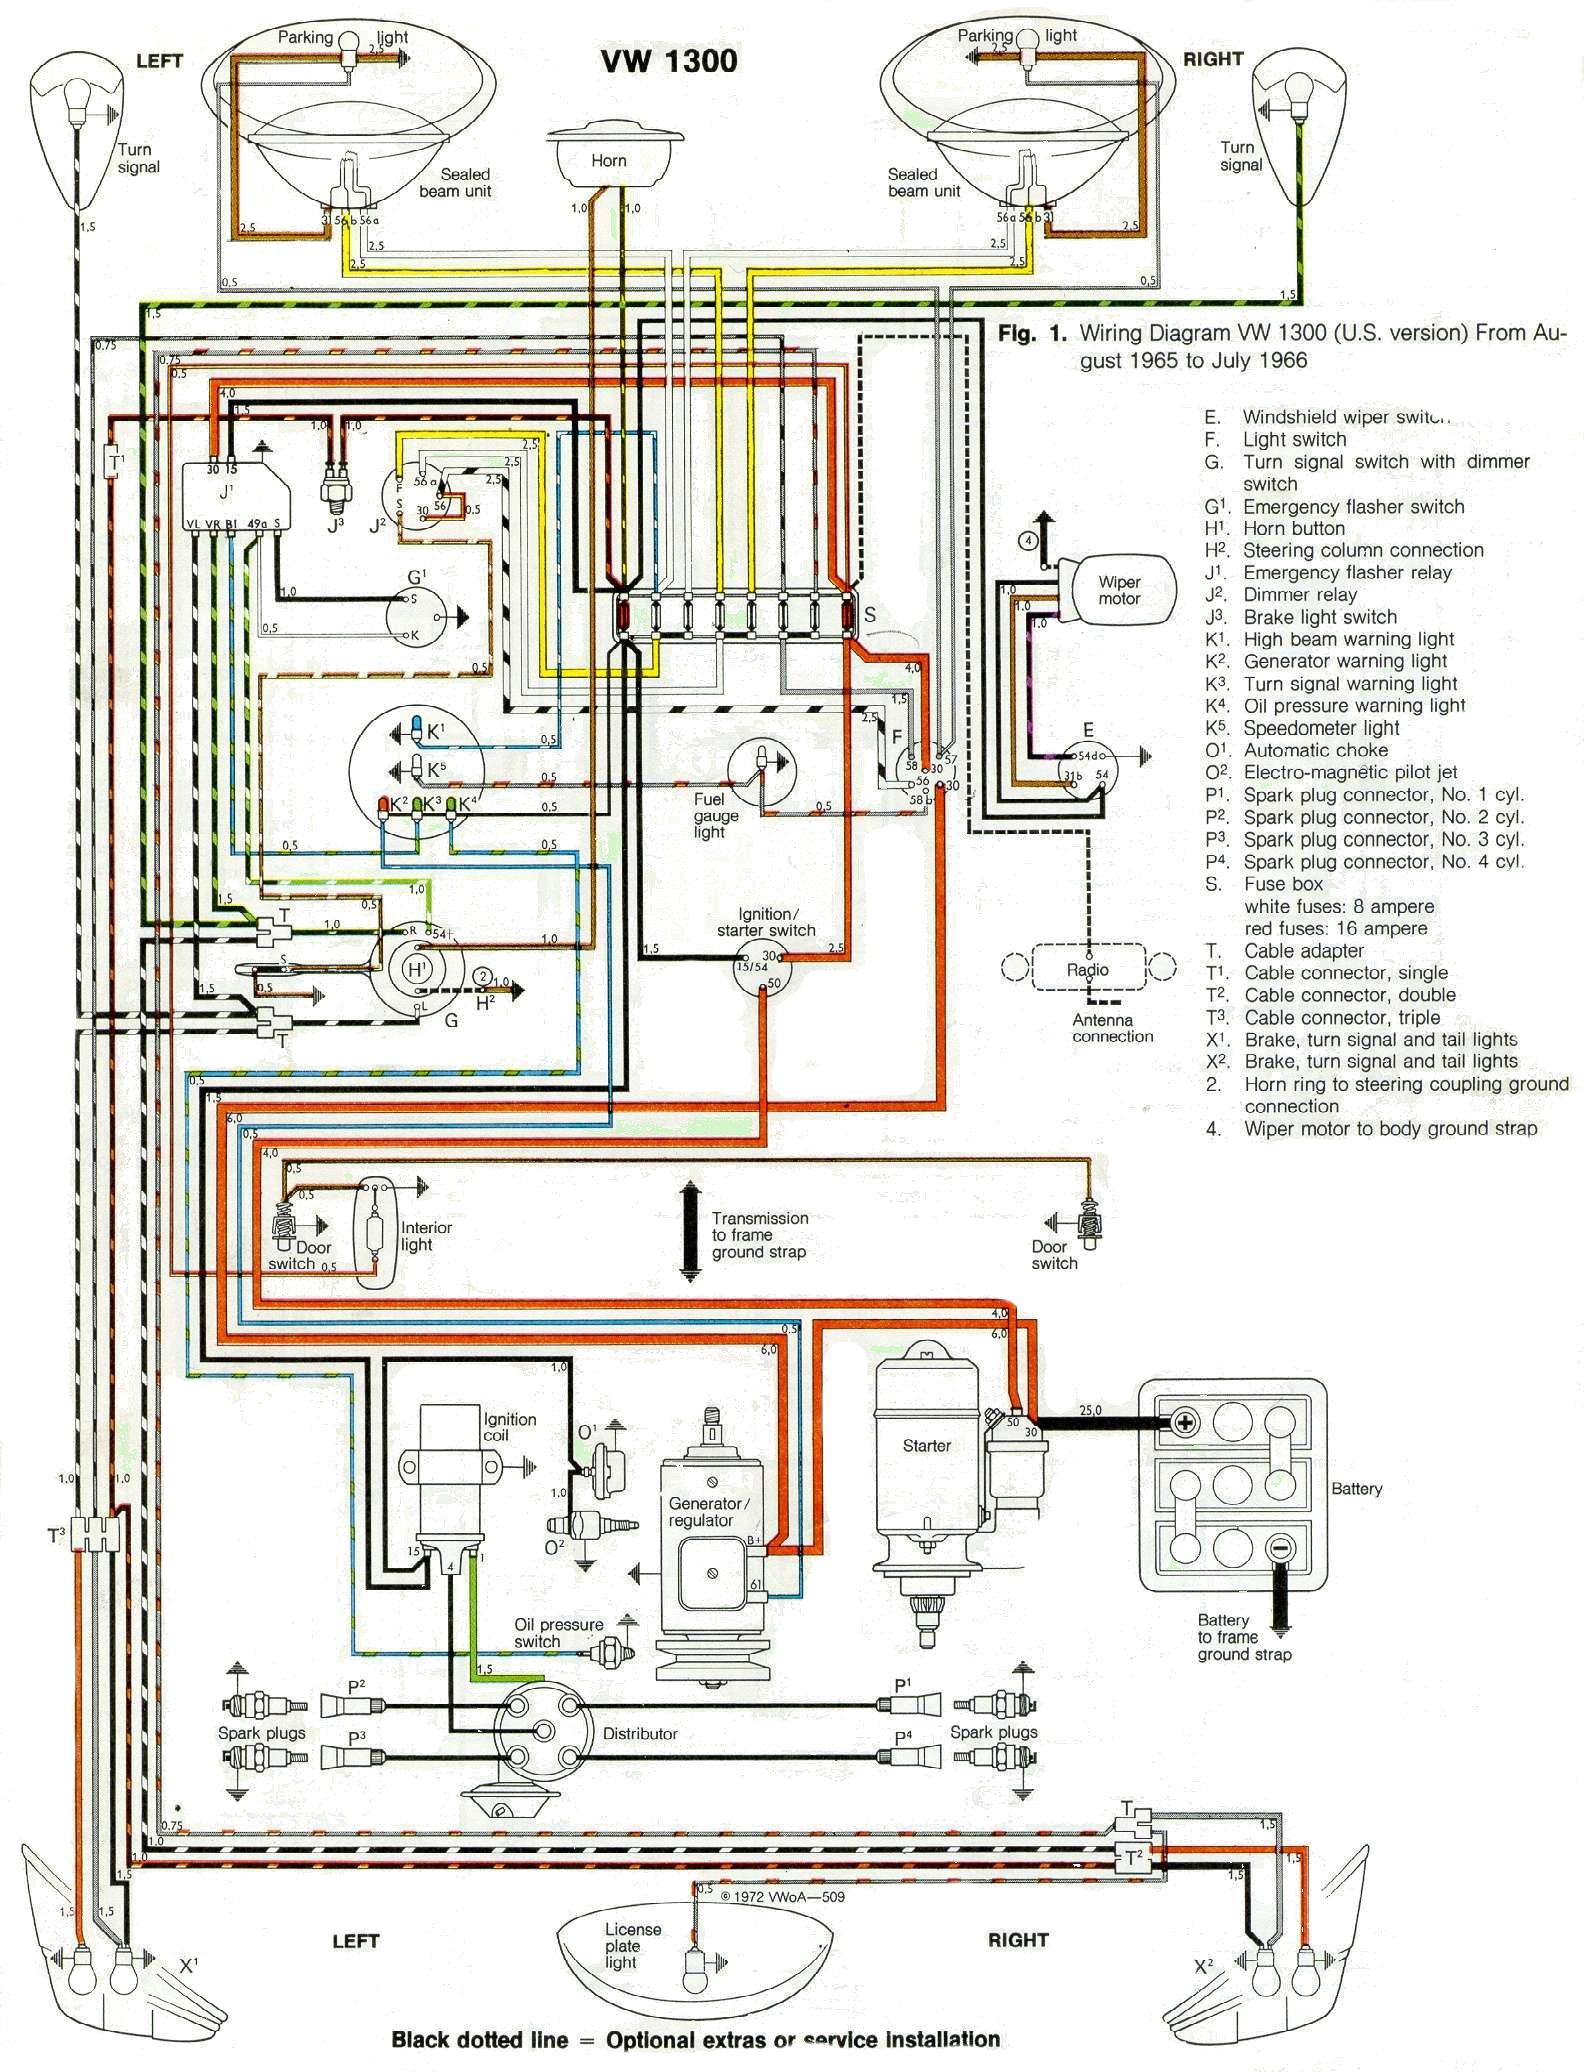 67 Vw Wiring Harness Wiring Diagram Dedicated Dedicated Pasticceriagele It